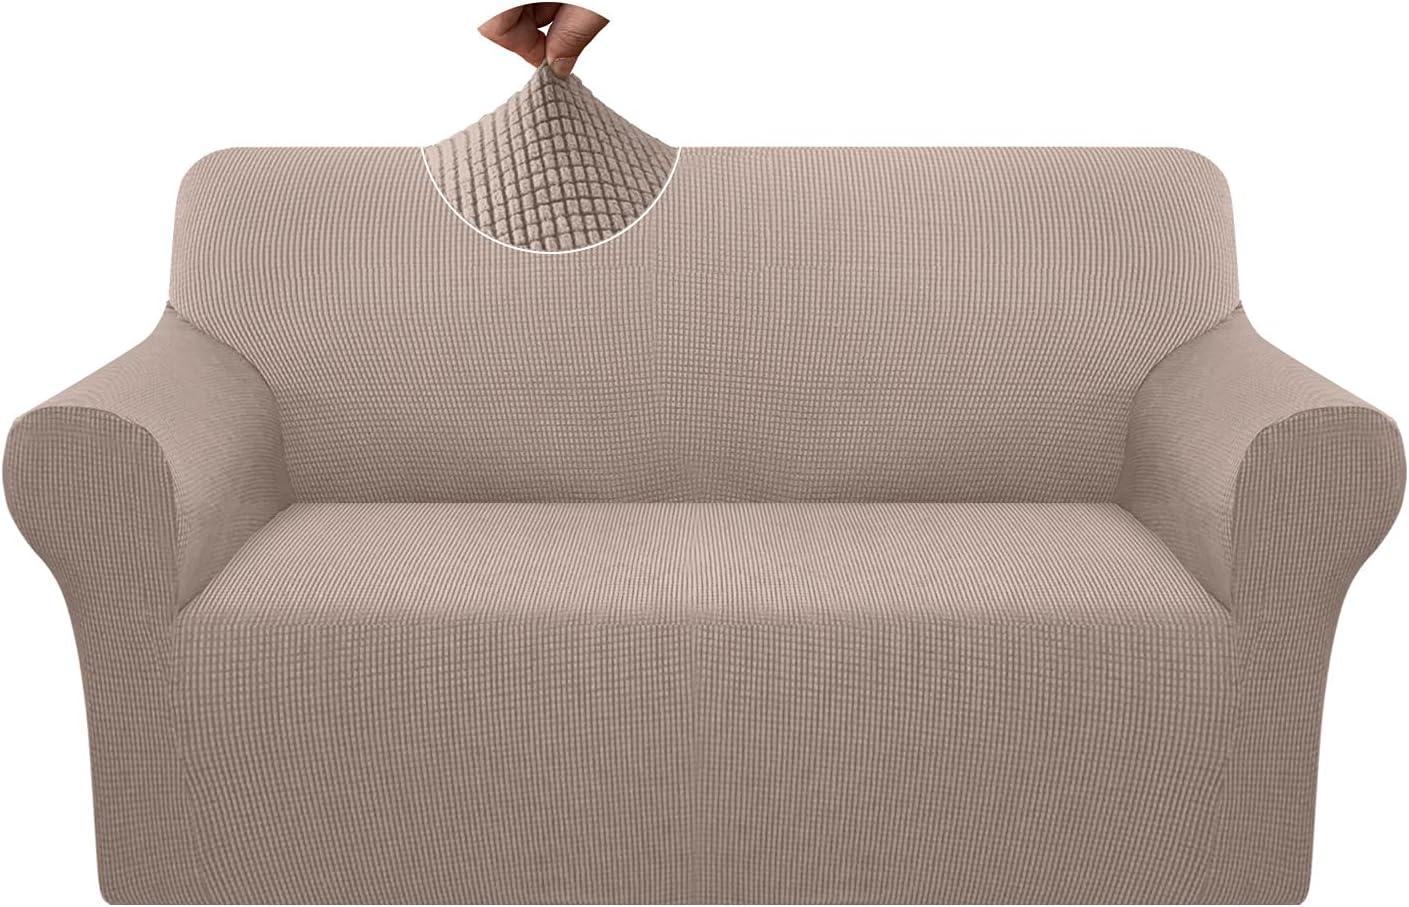 Pepibear Seattle Mall 1 Piece Stretch Luxury Loveseat for Sofa Anti-Slip Cover